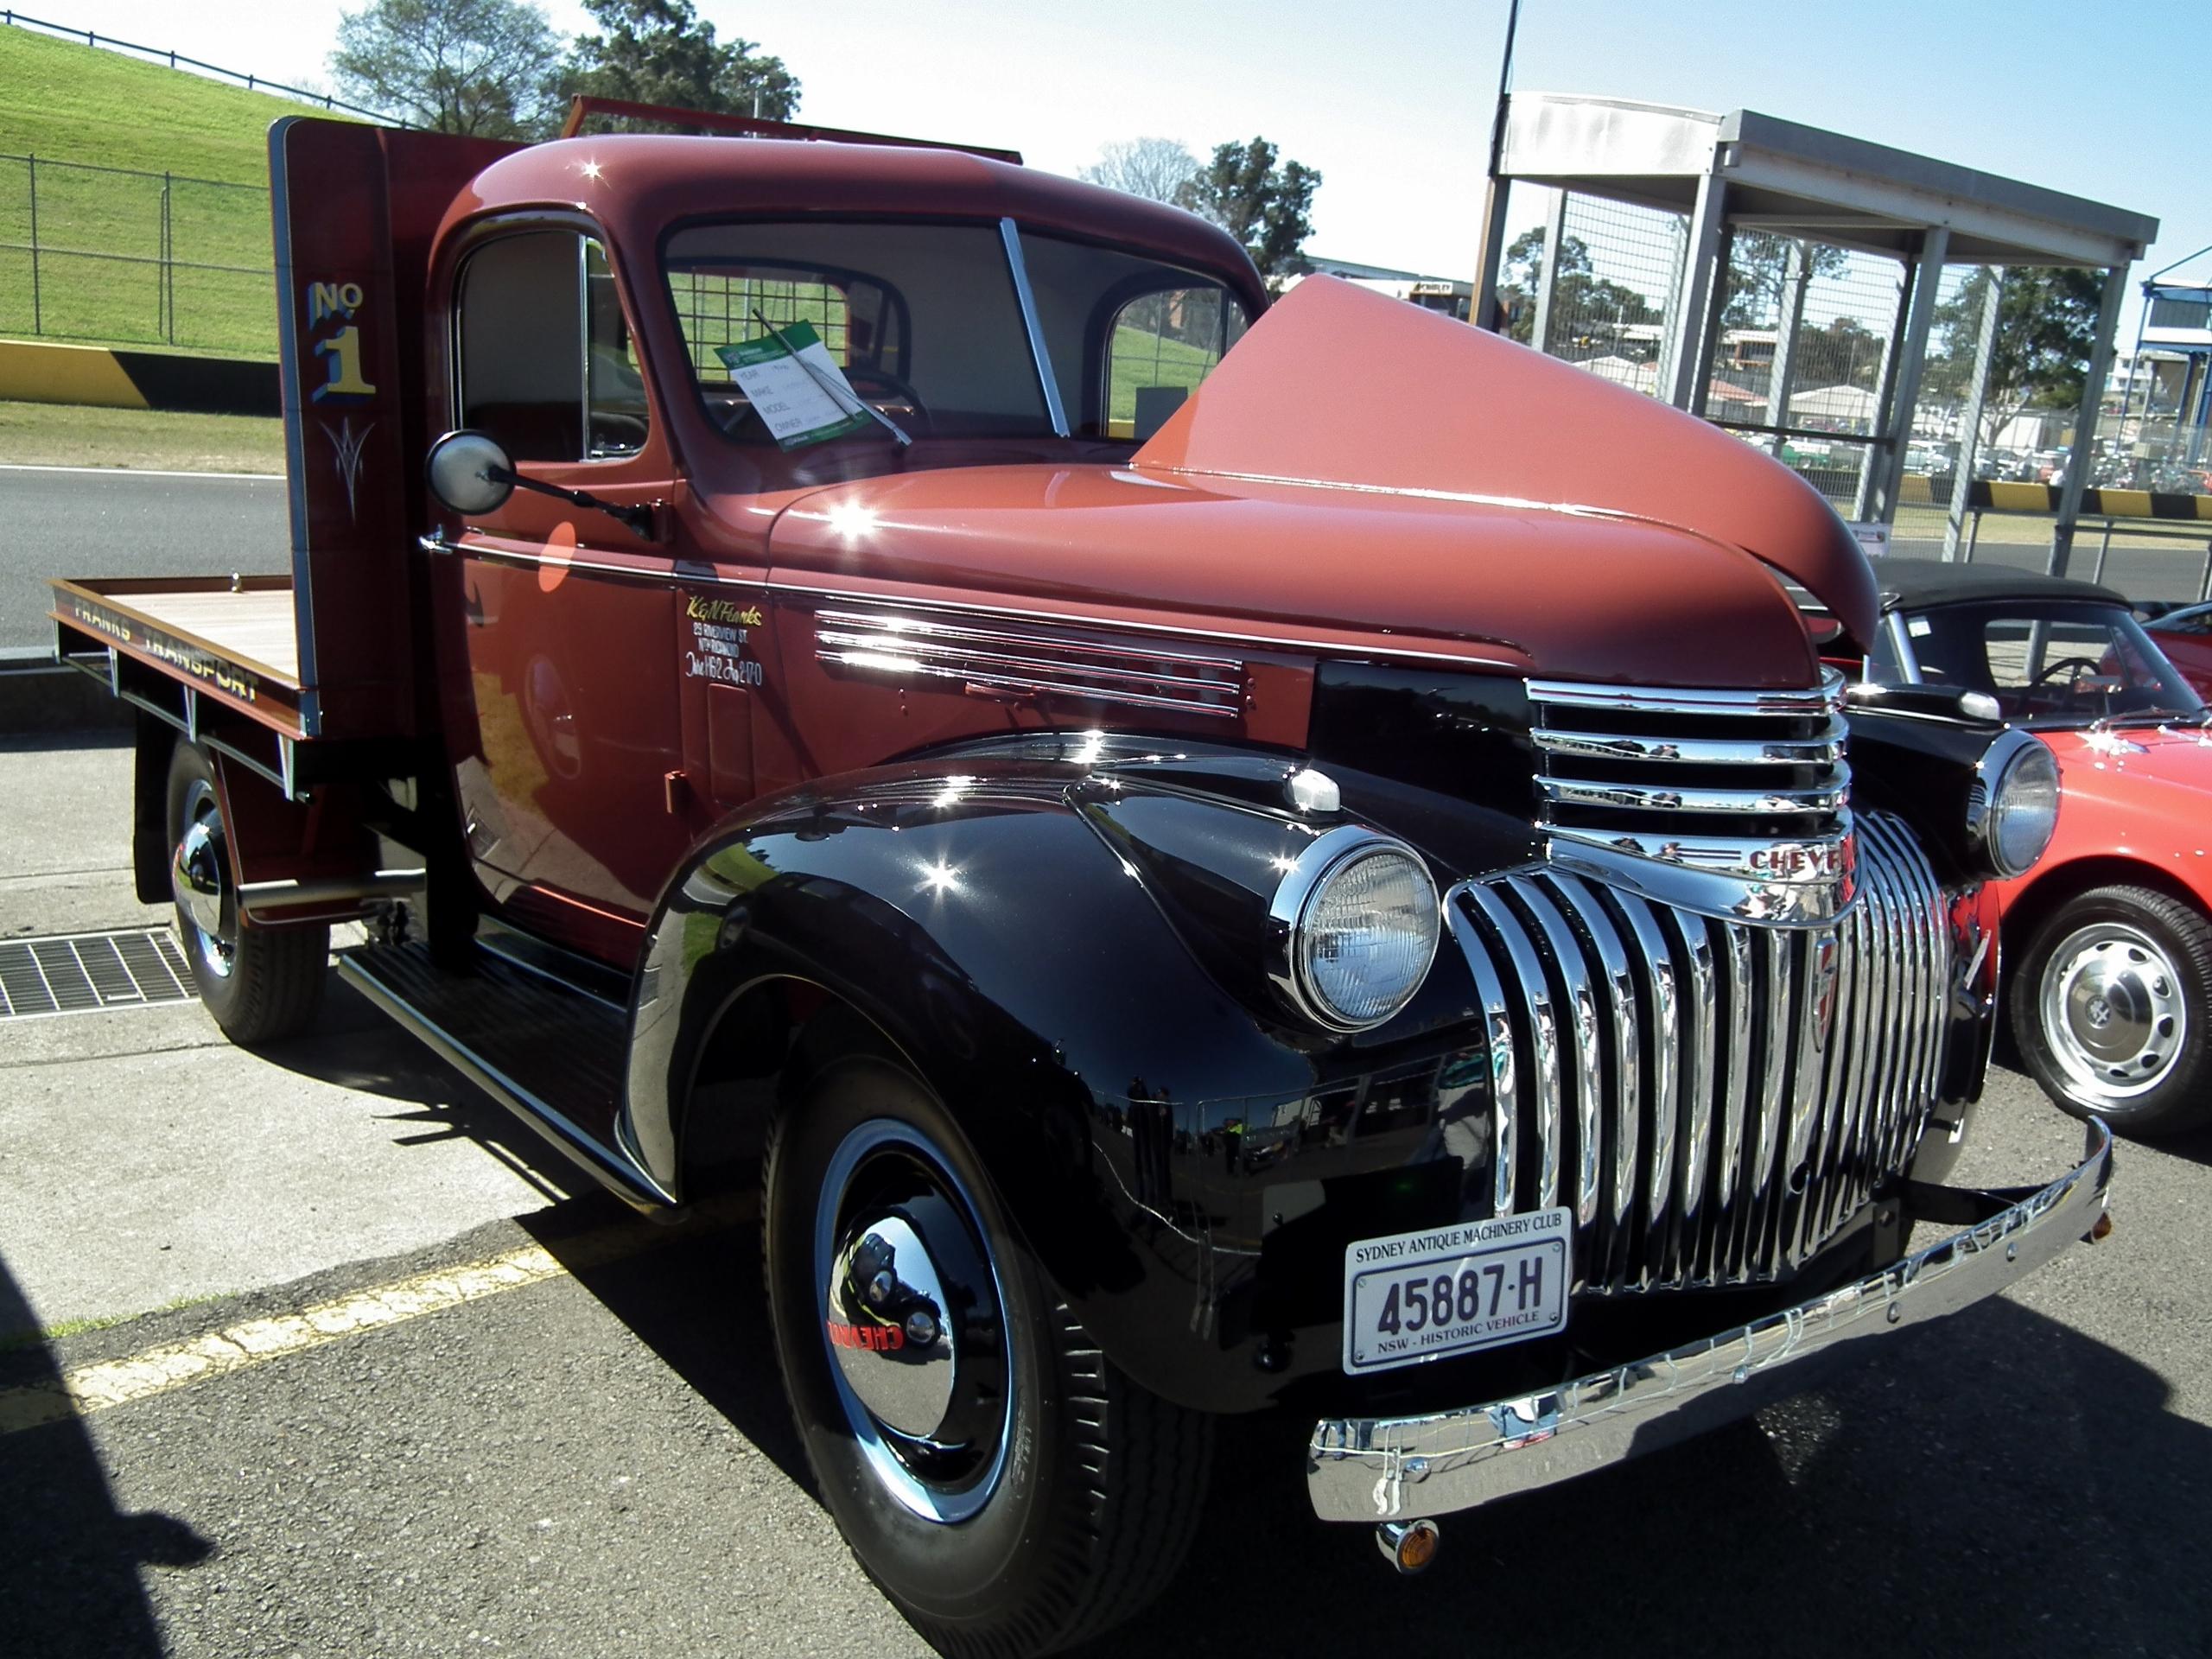 File:1946 Chevrolet table top truck (9597931218).jpg - Wikimedia ...